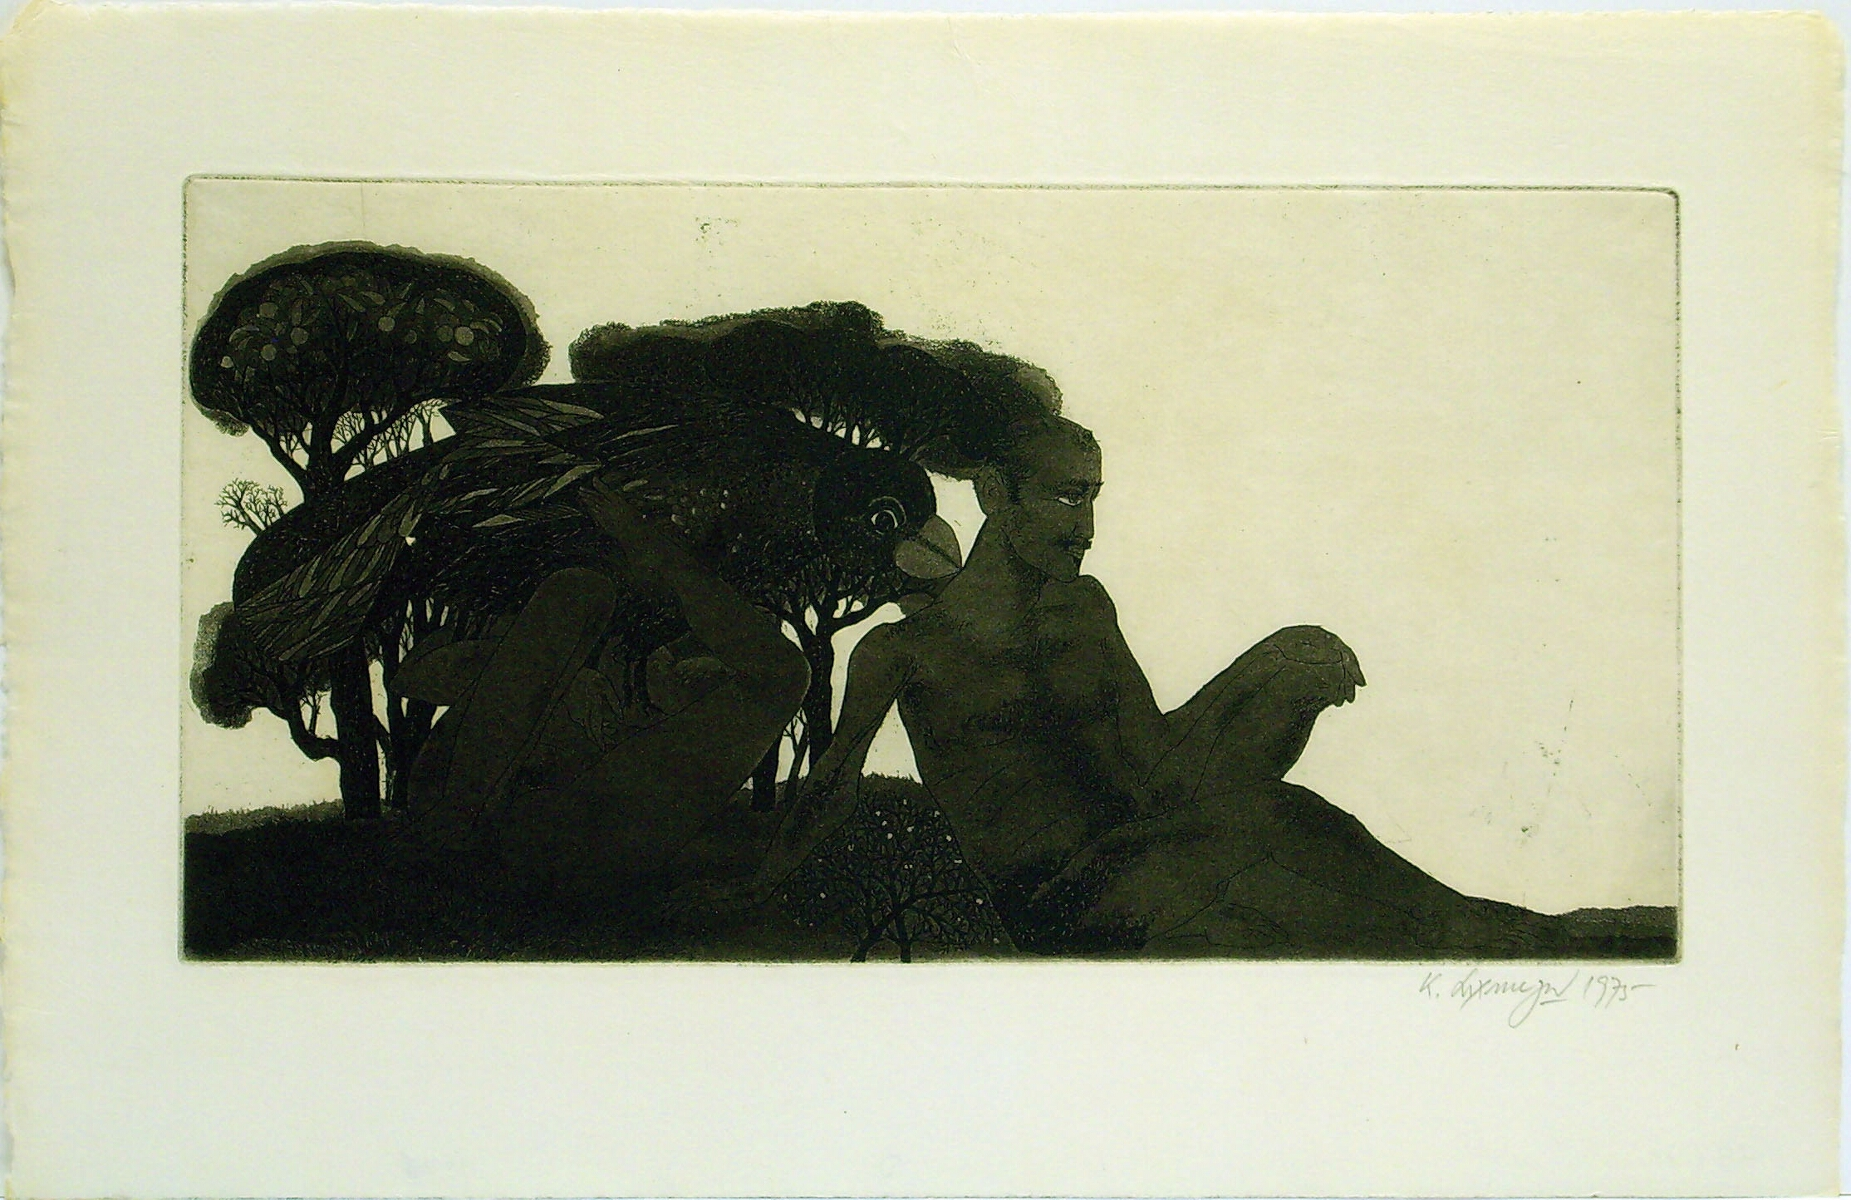 Untitled (Circa 1970)